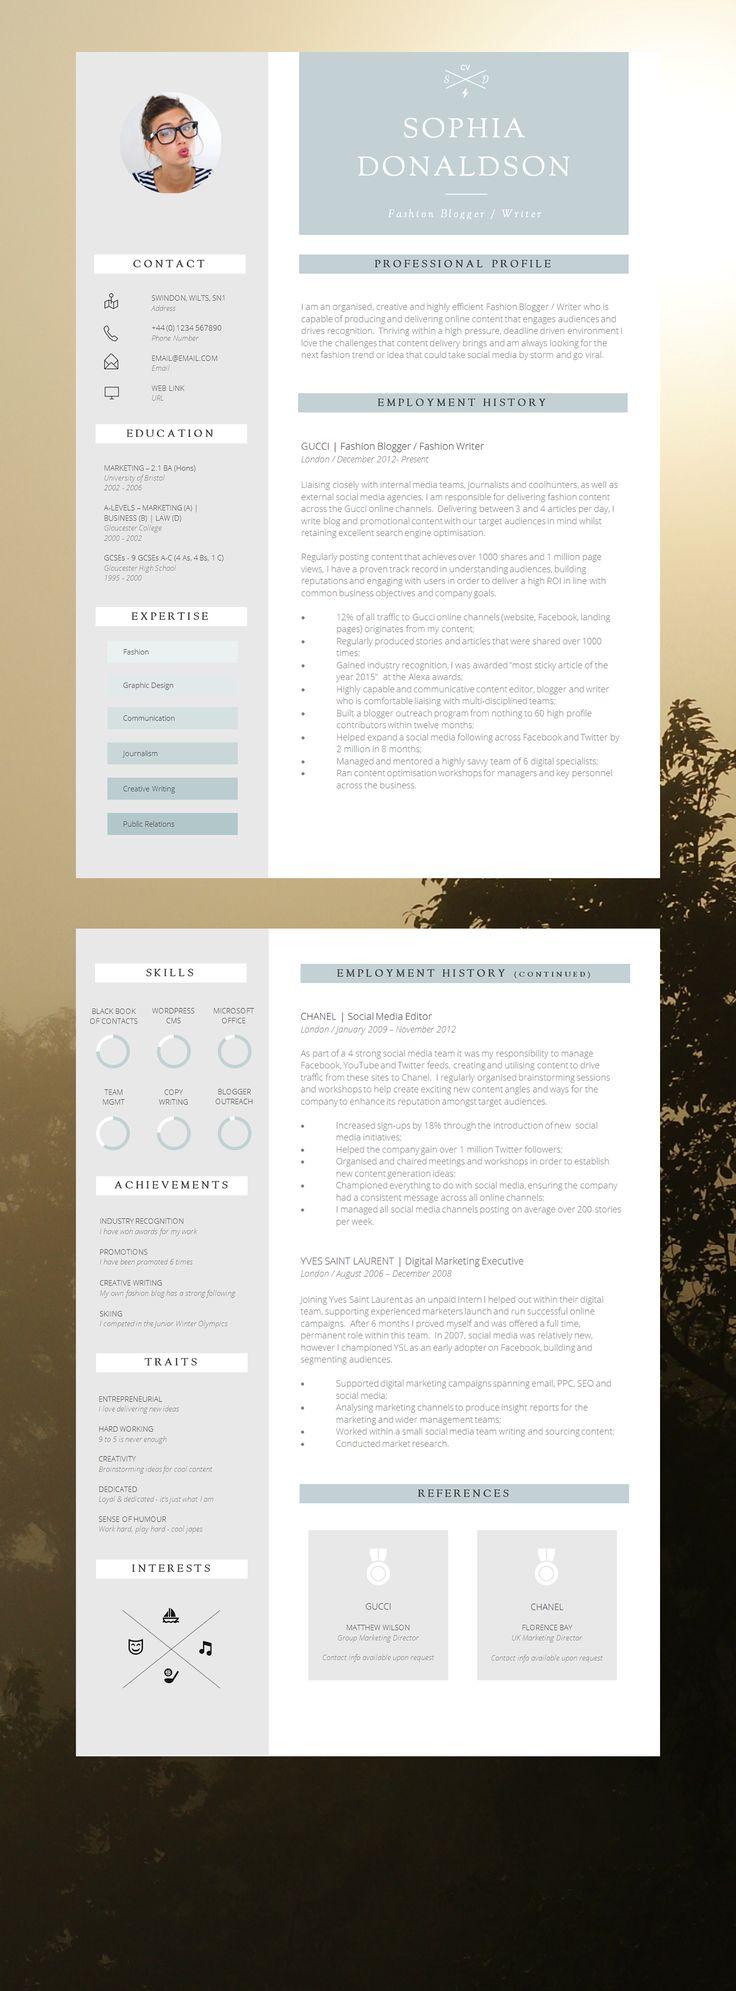 Infographic Cv Template Modern Cv Design Don T